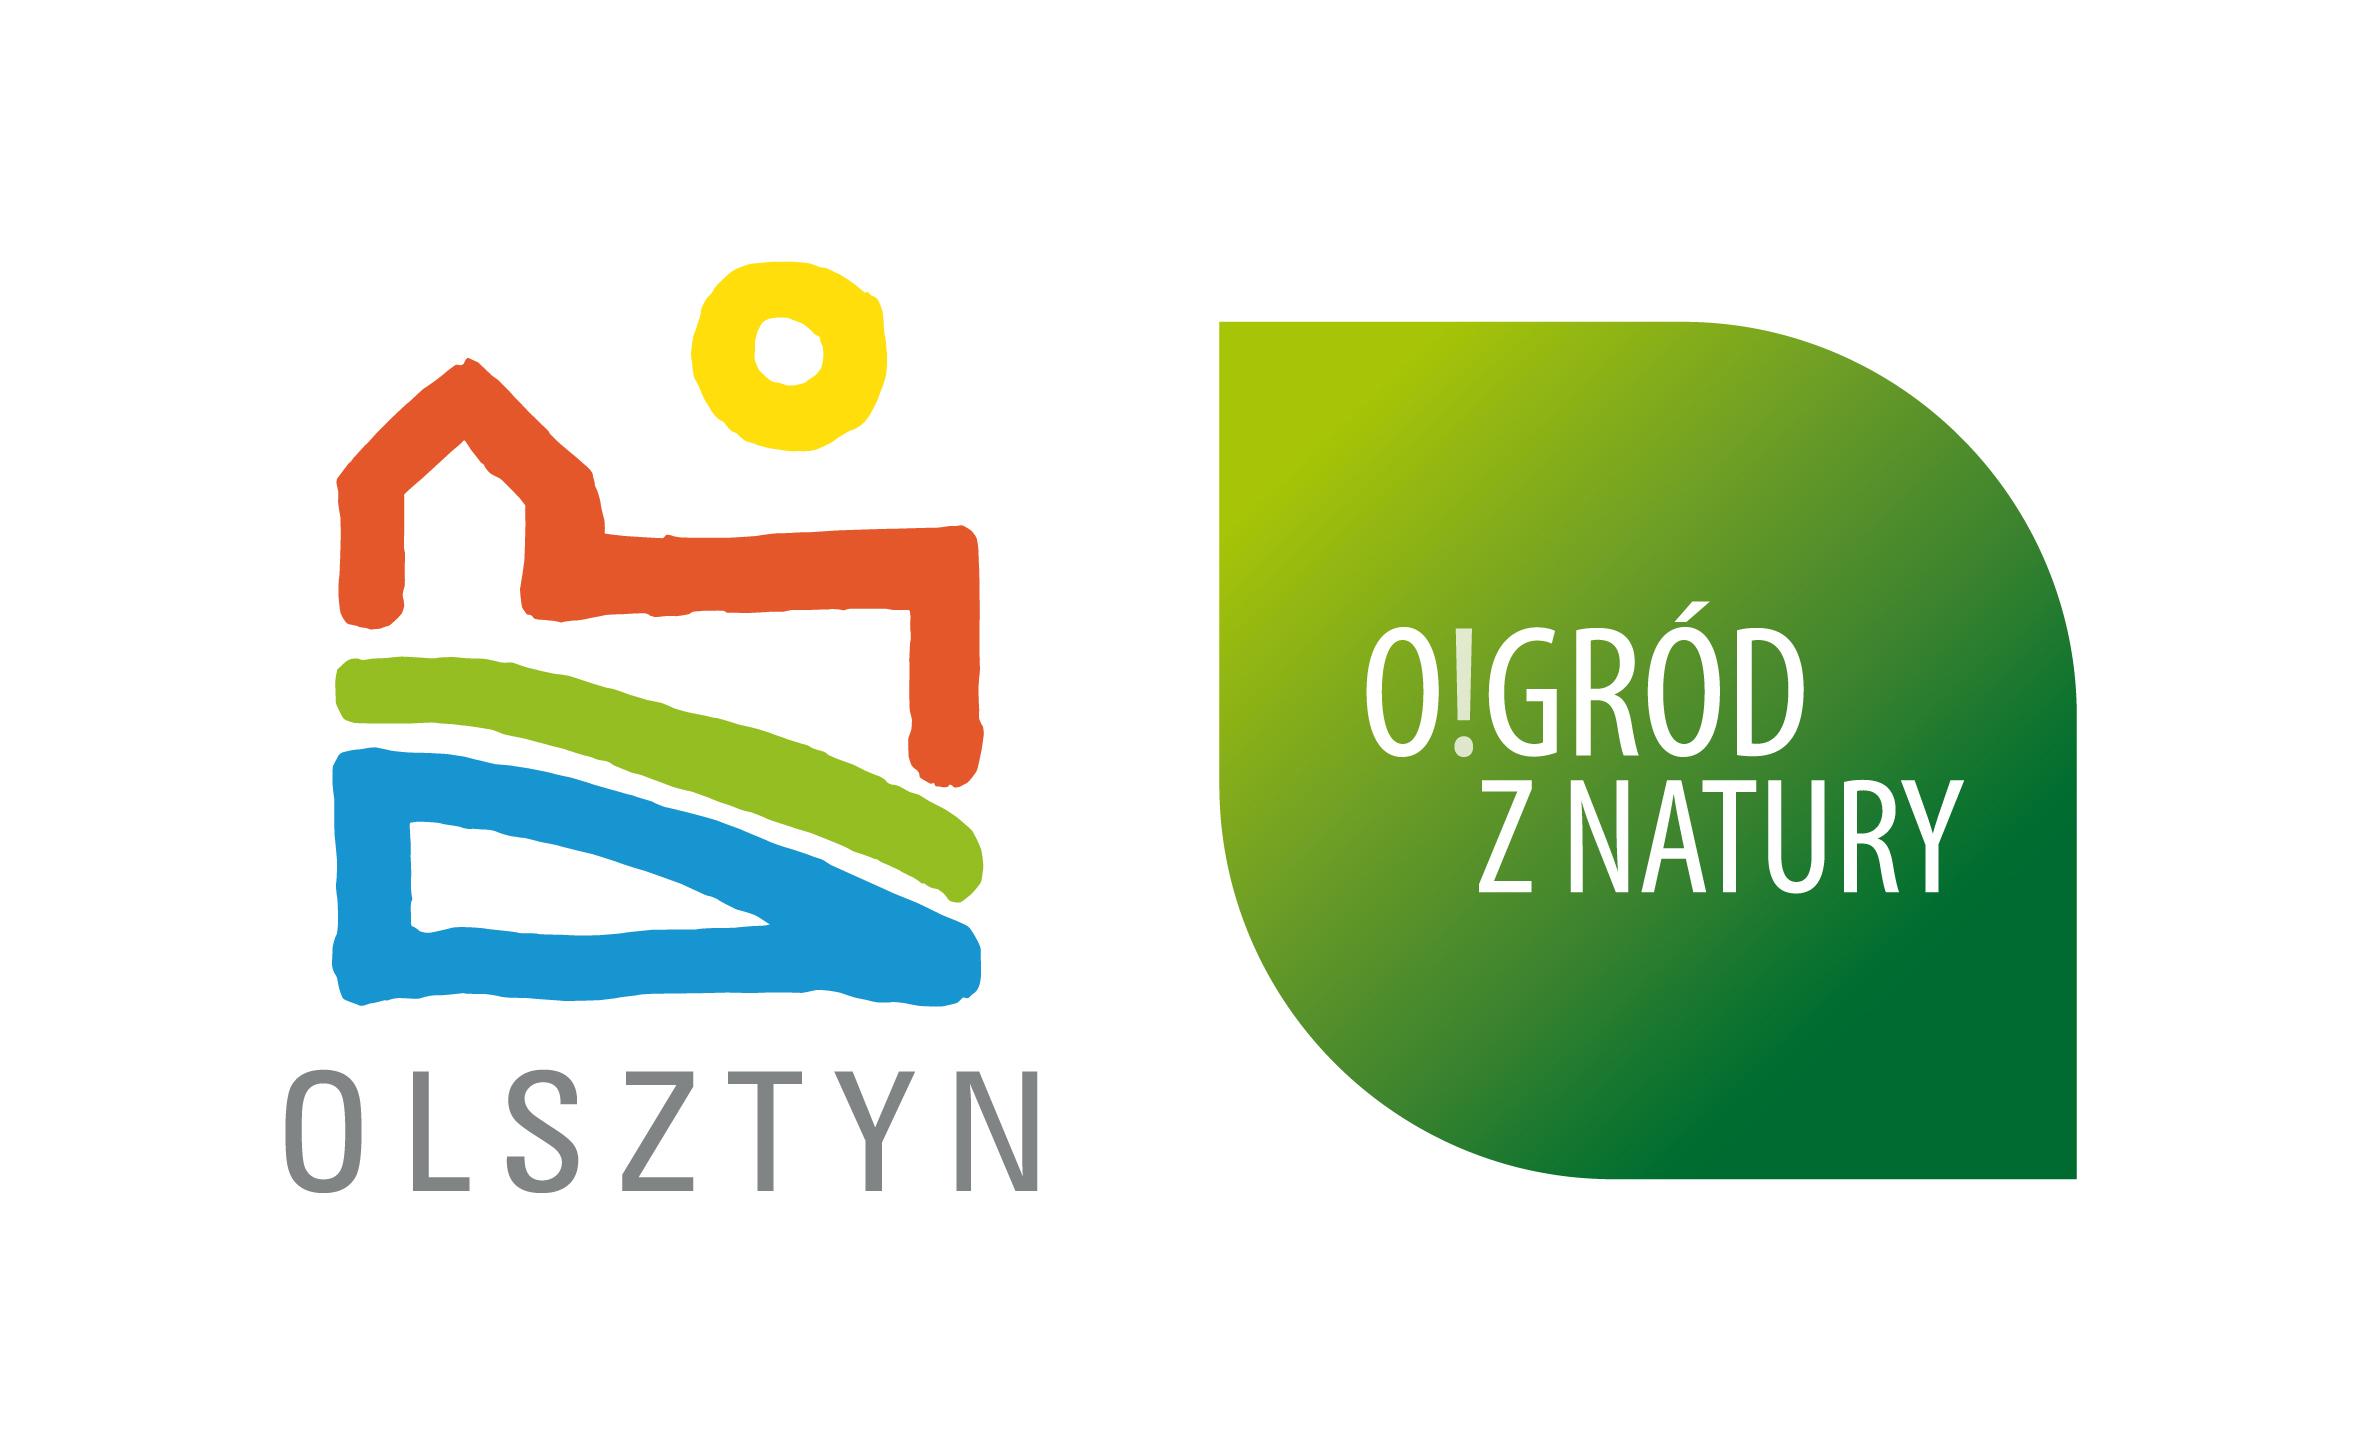 http://m.wmwm.pl/2018/07/orig/logo-z-listkiem-6130.jpg